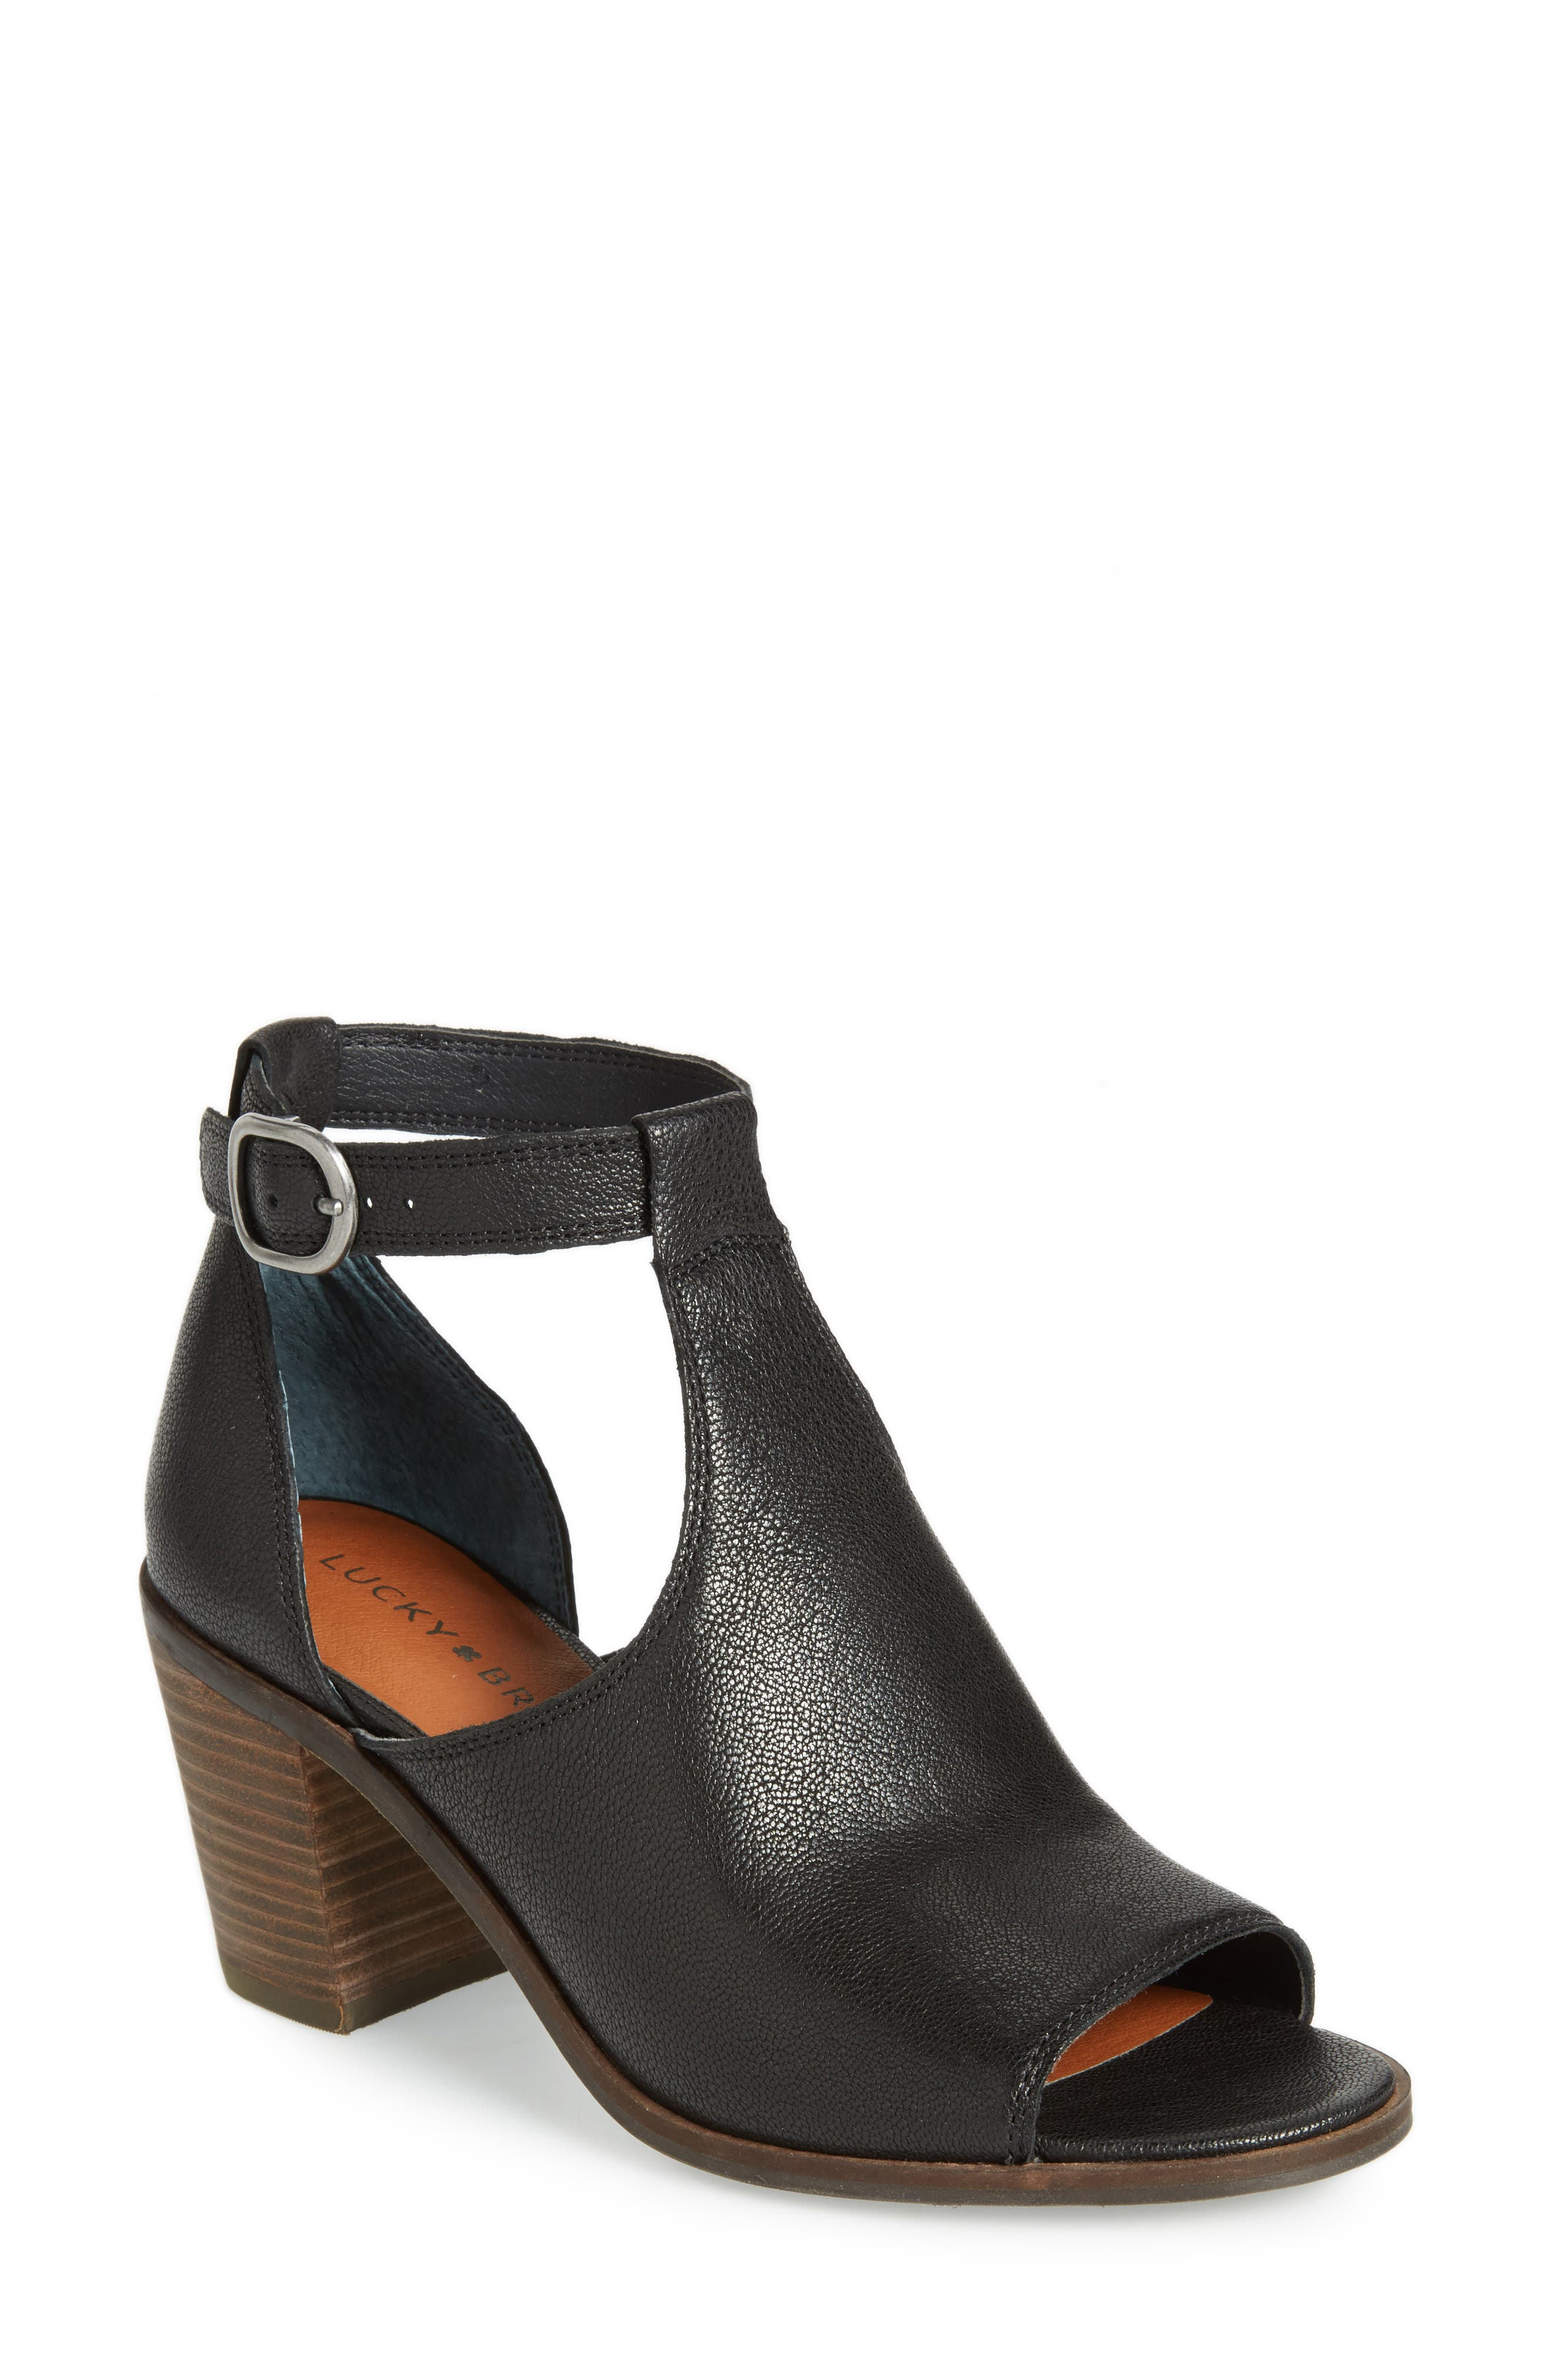 Kadian Block Heel Sandal,                         Main,                         color,